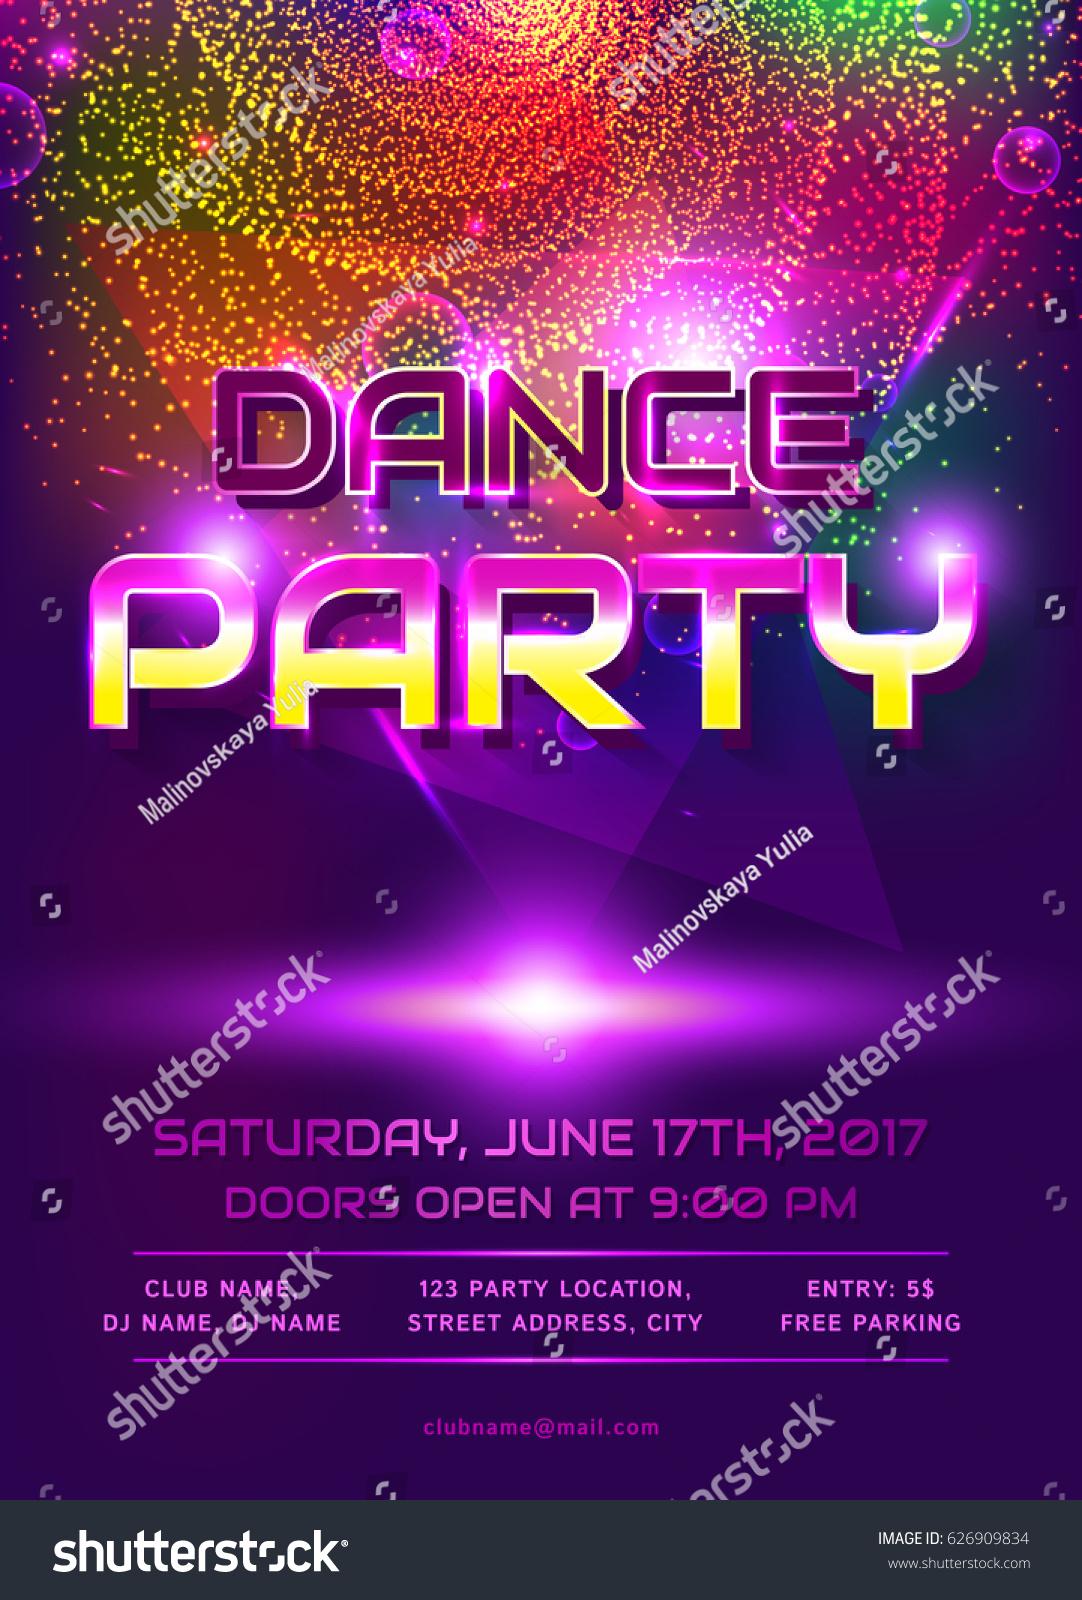 Comfortable Dj Party Invitations Gallery Invitation Card Ideas - Party invitation template: dance party invitations templates